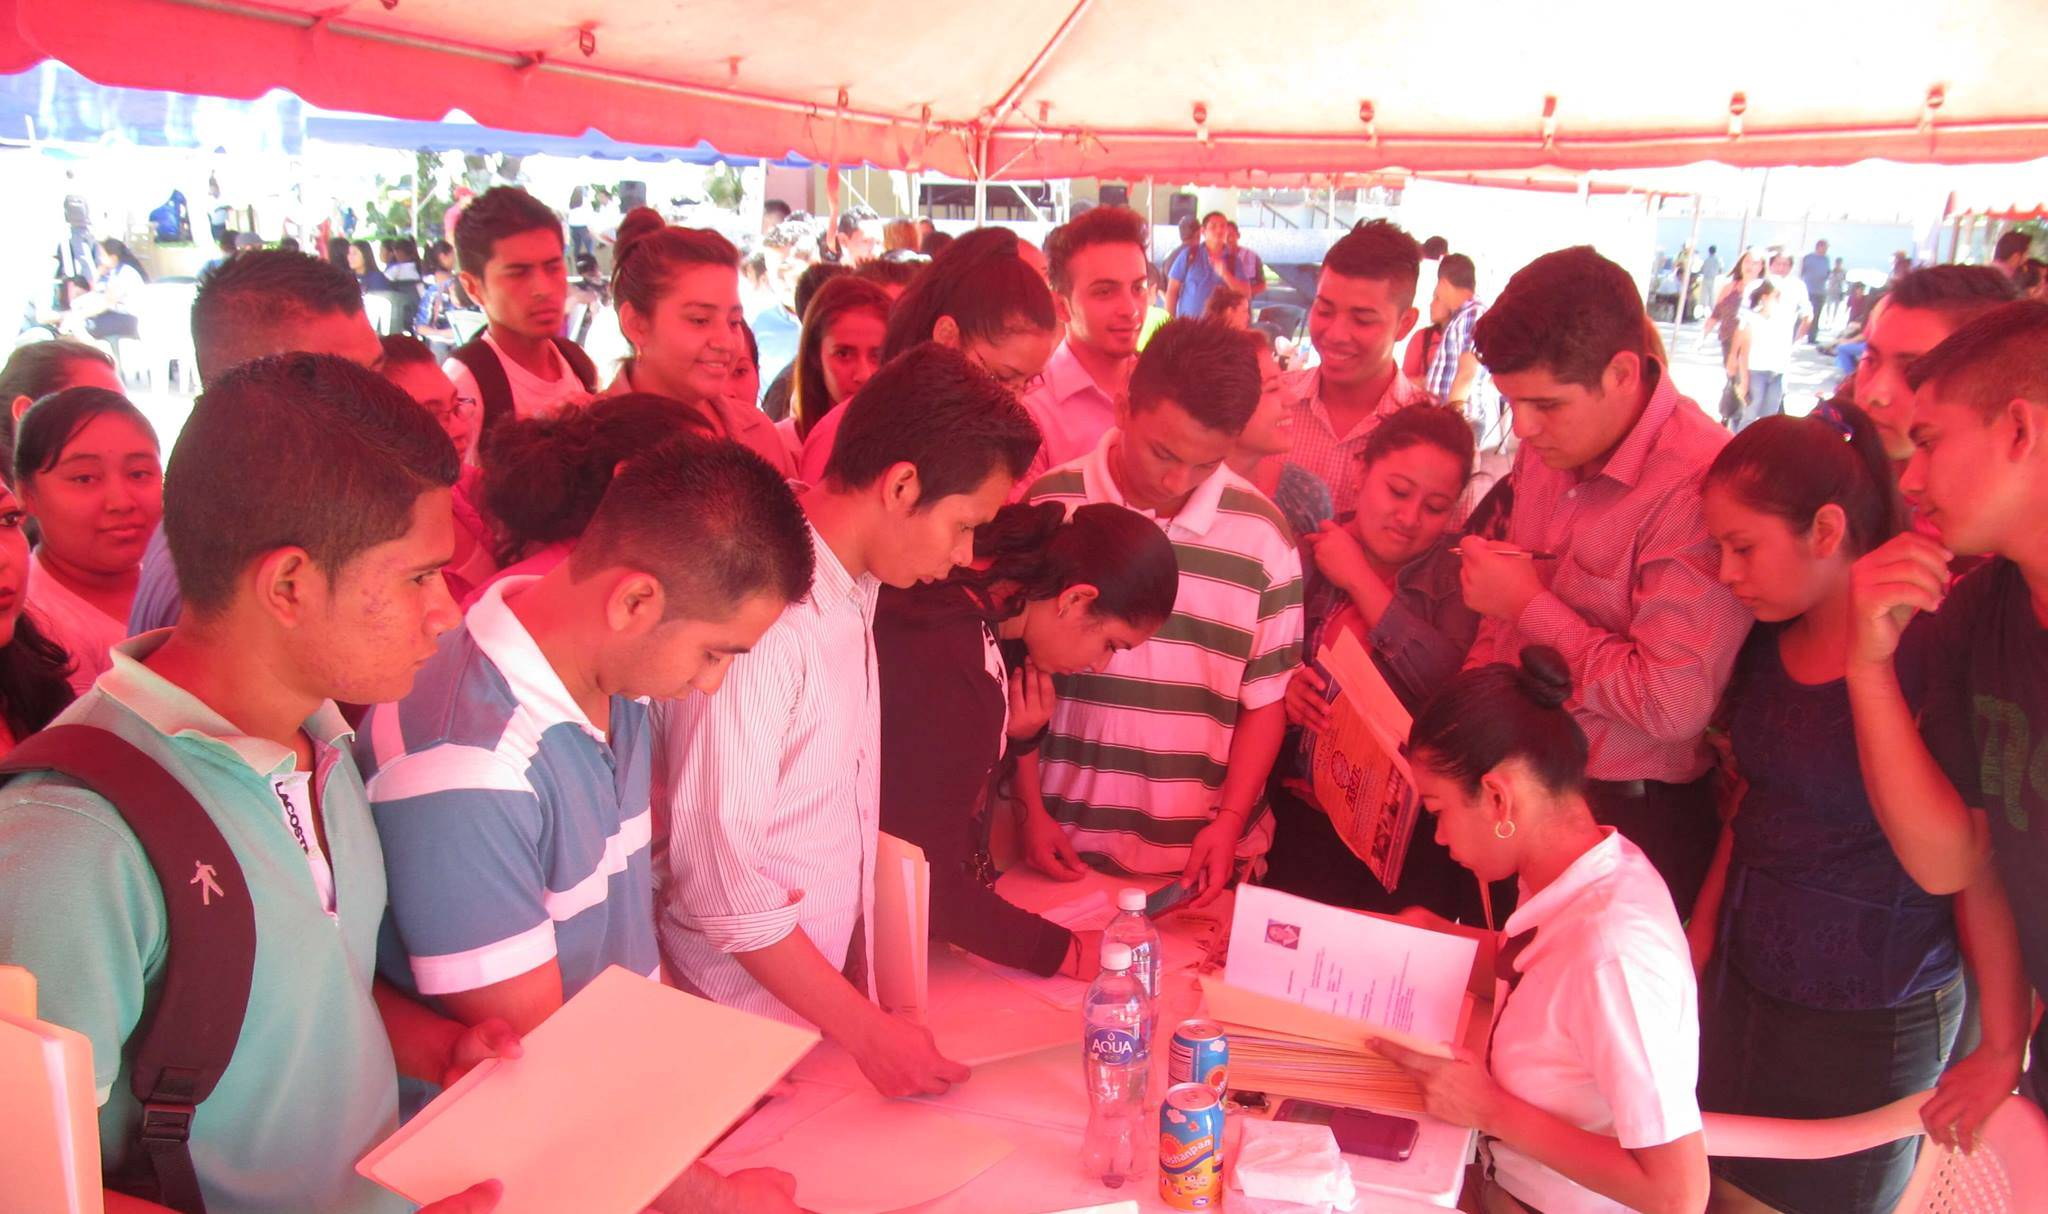 COFOA Leaders Organize Job Fair For 300 Youth